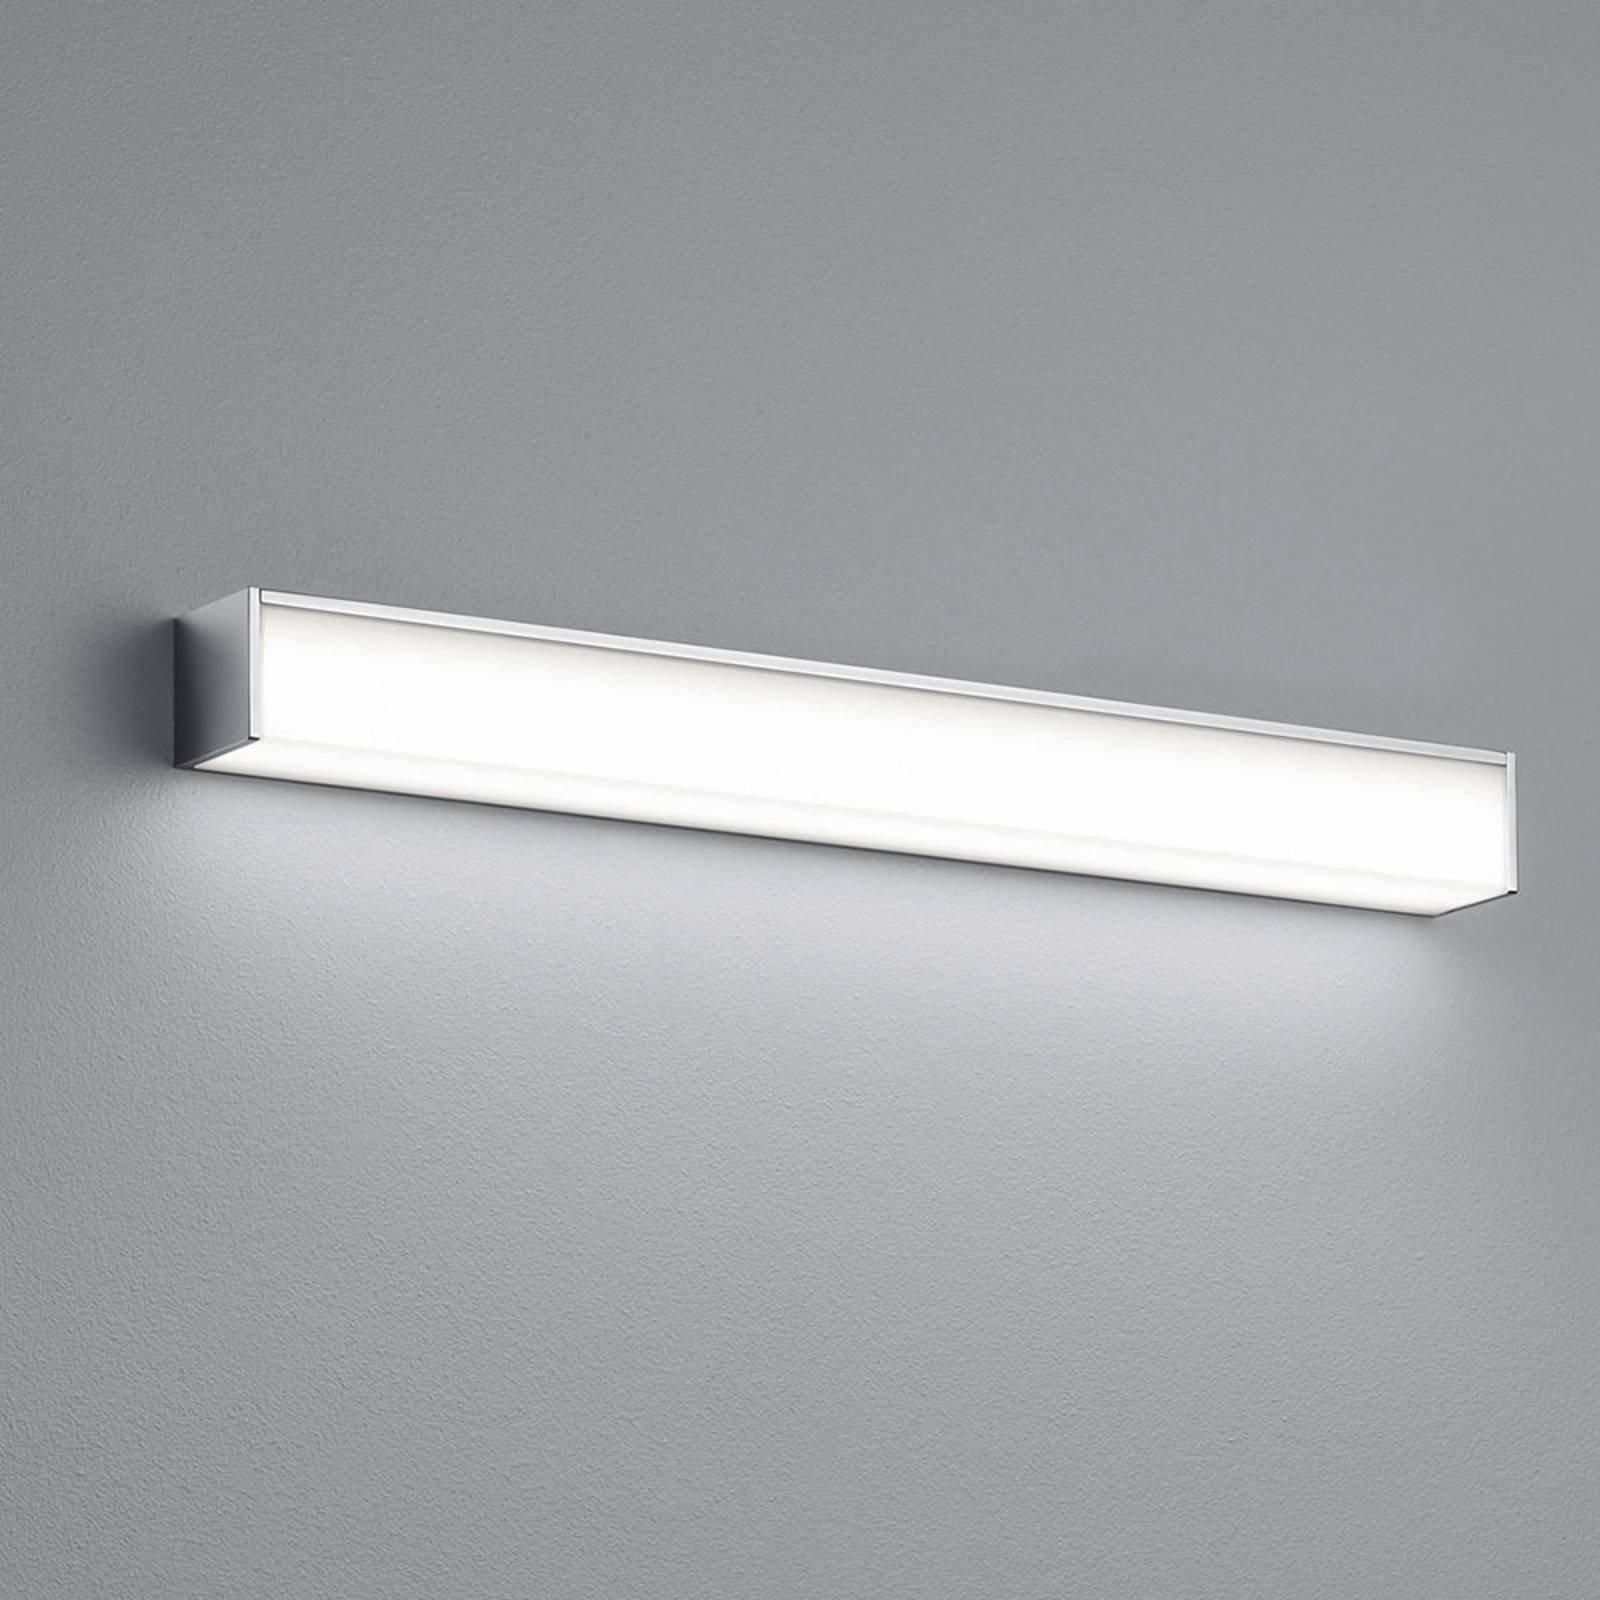 Helestra Nok LED-speillampe, 60 cm